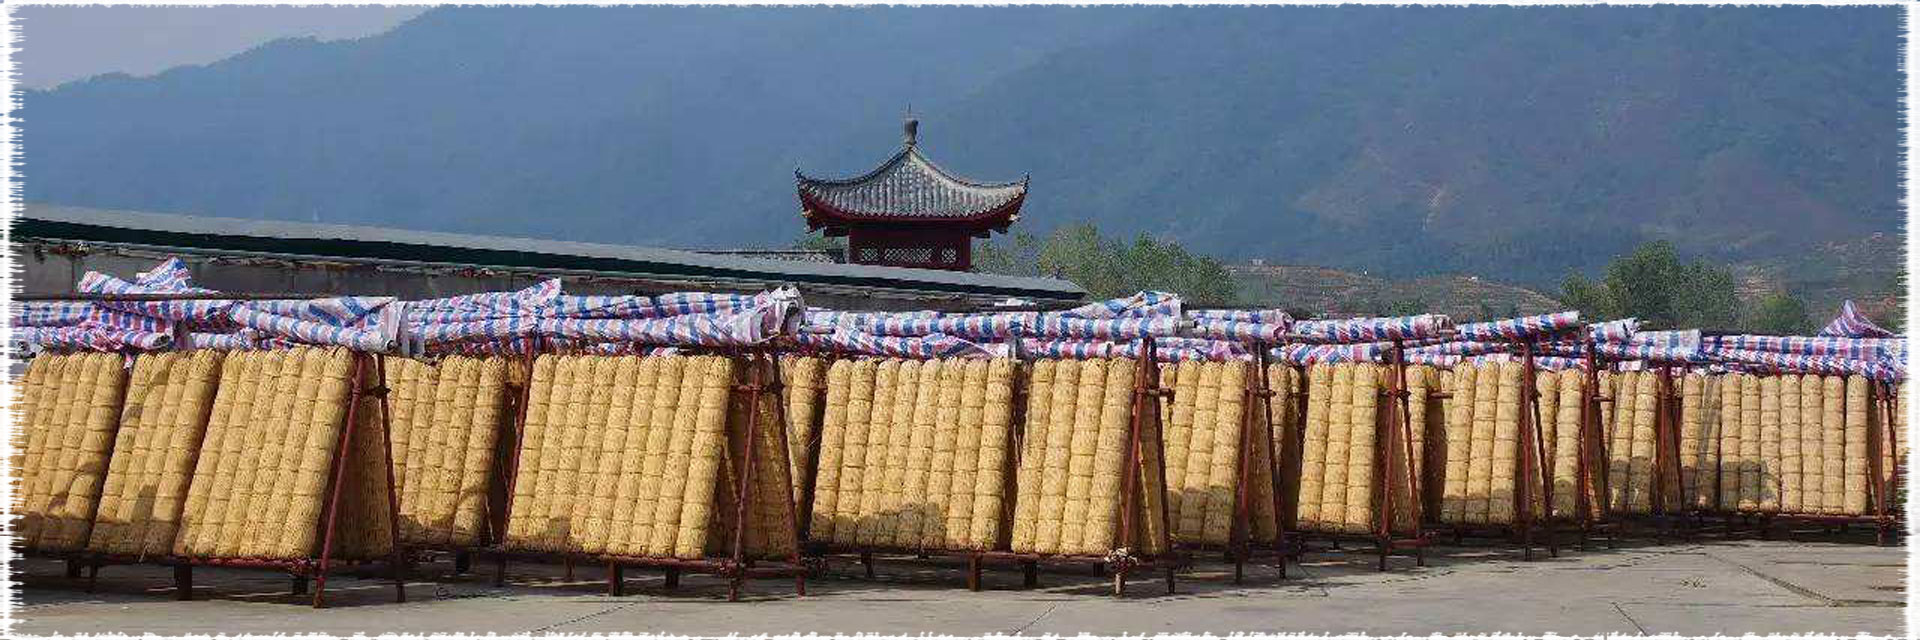 Le thé QianLiang